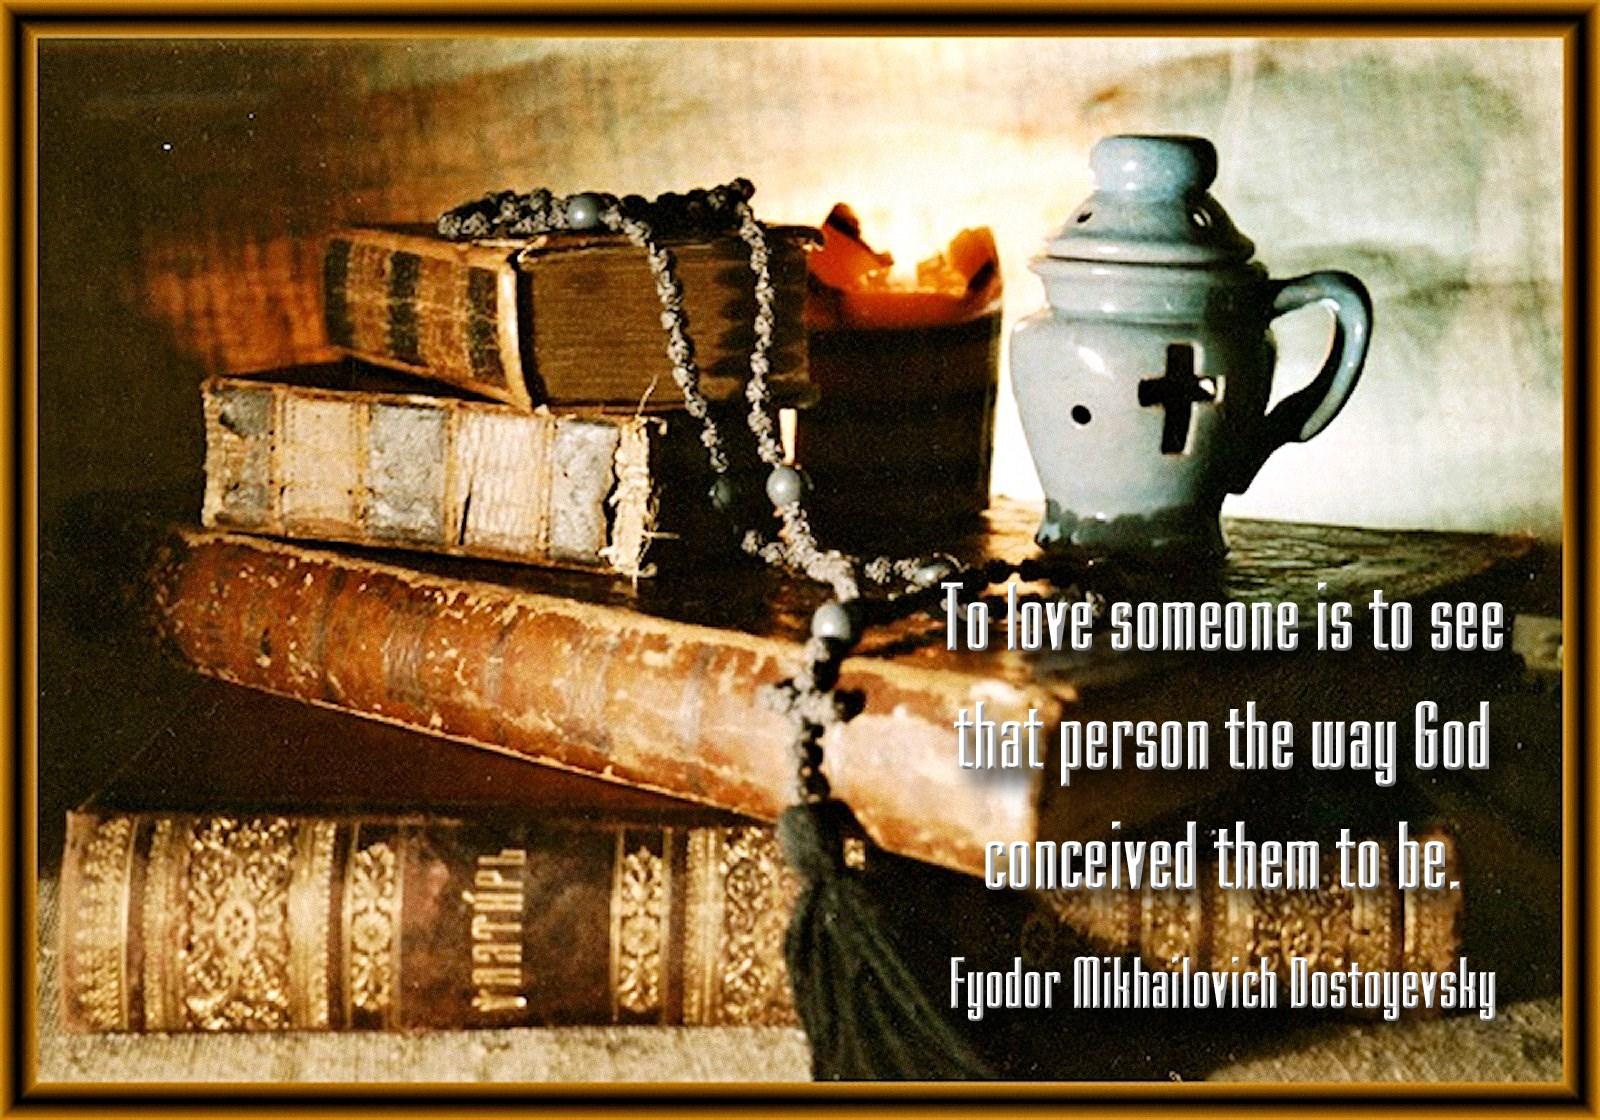 00 cross and books. russian orthodox. dostoyevsky. 030715